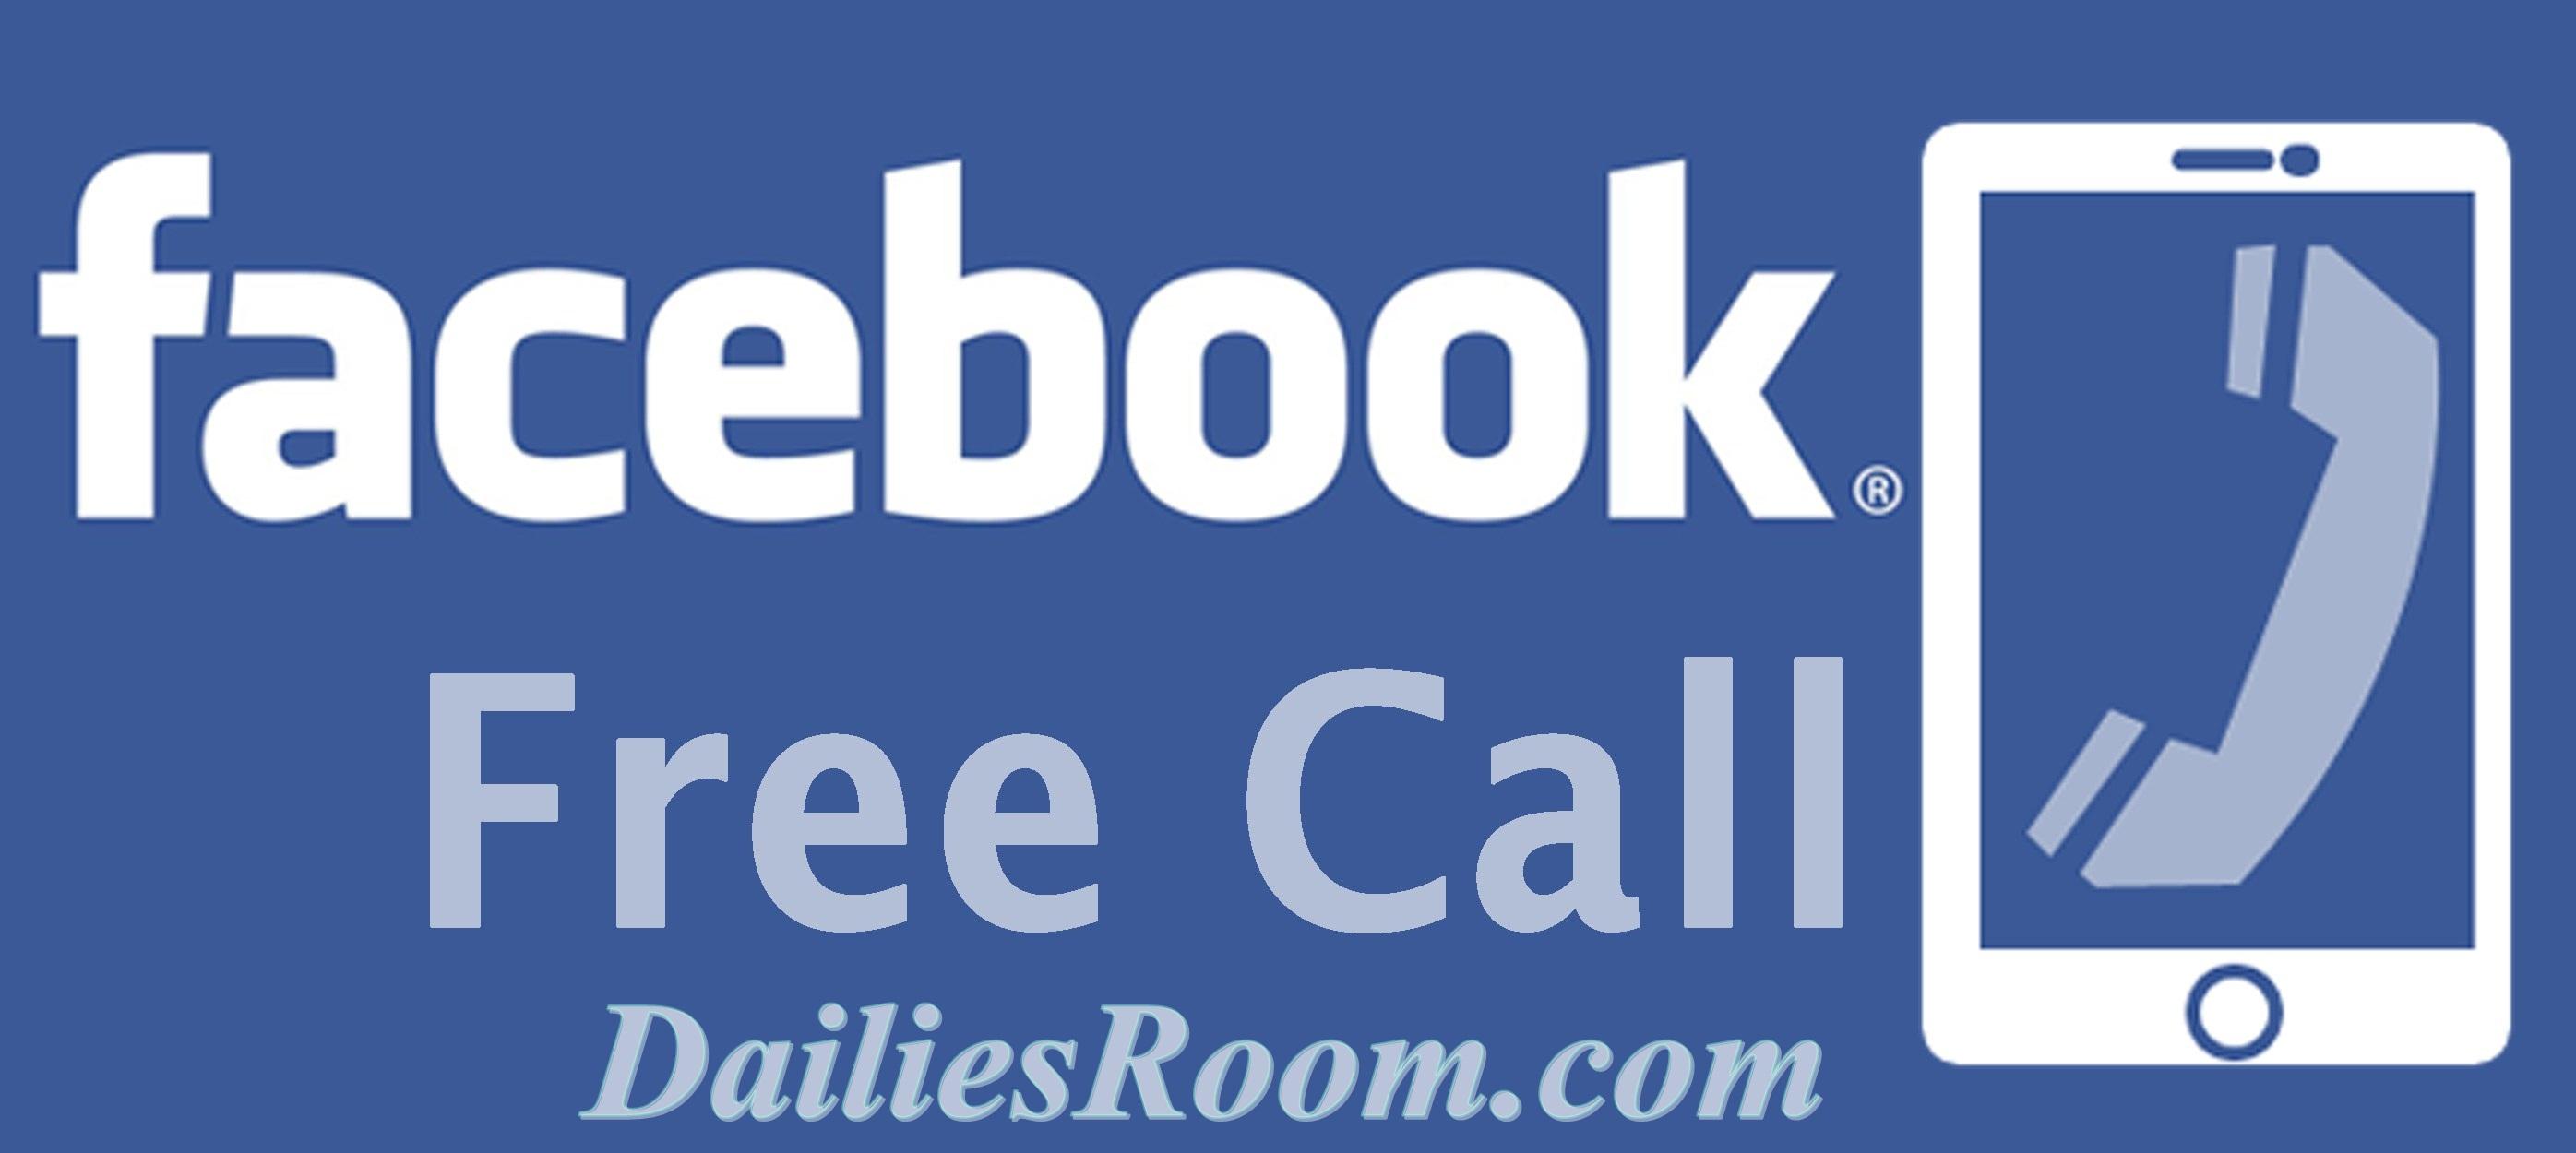 How to Make Free calls Using Facebook Messenger | Facebook free calls